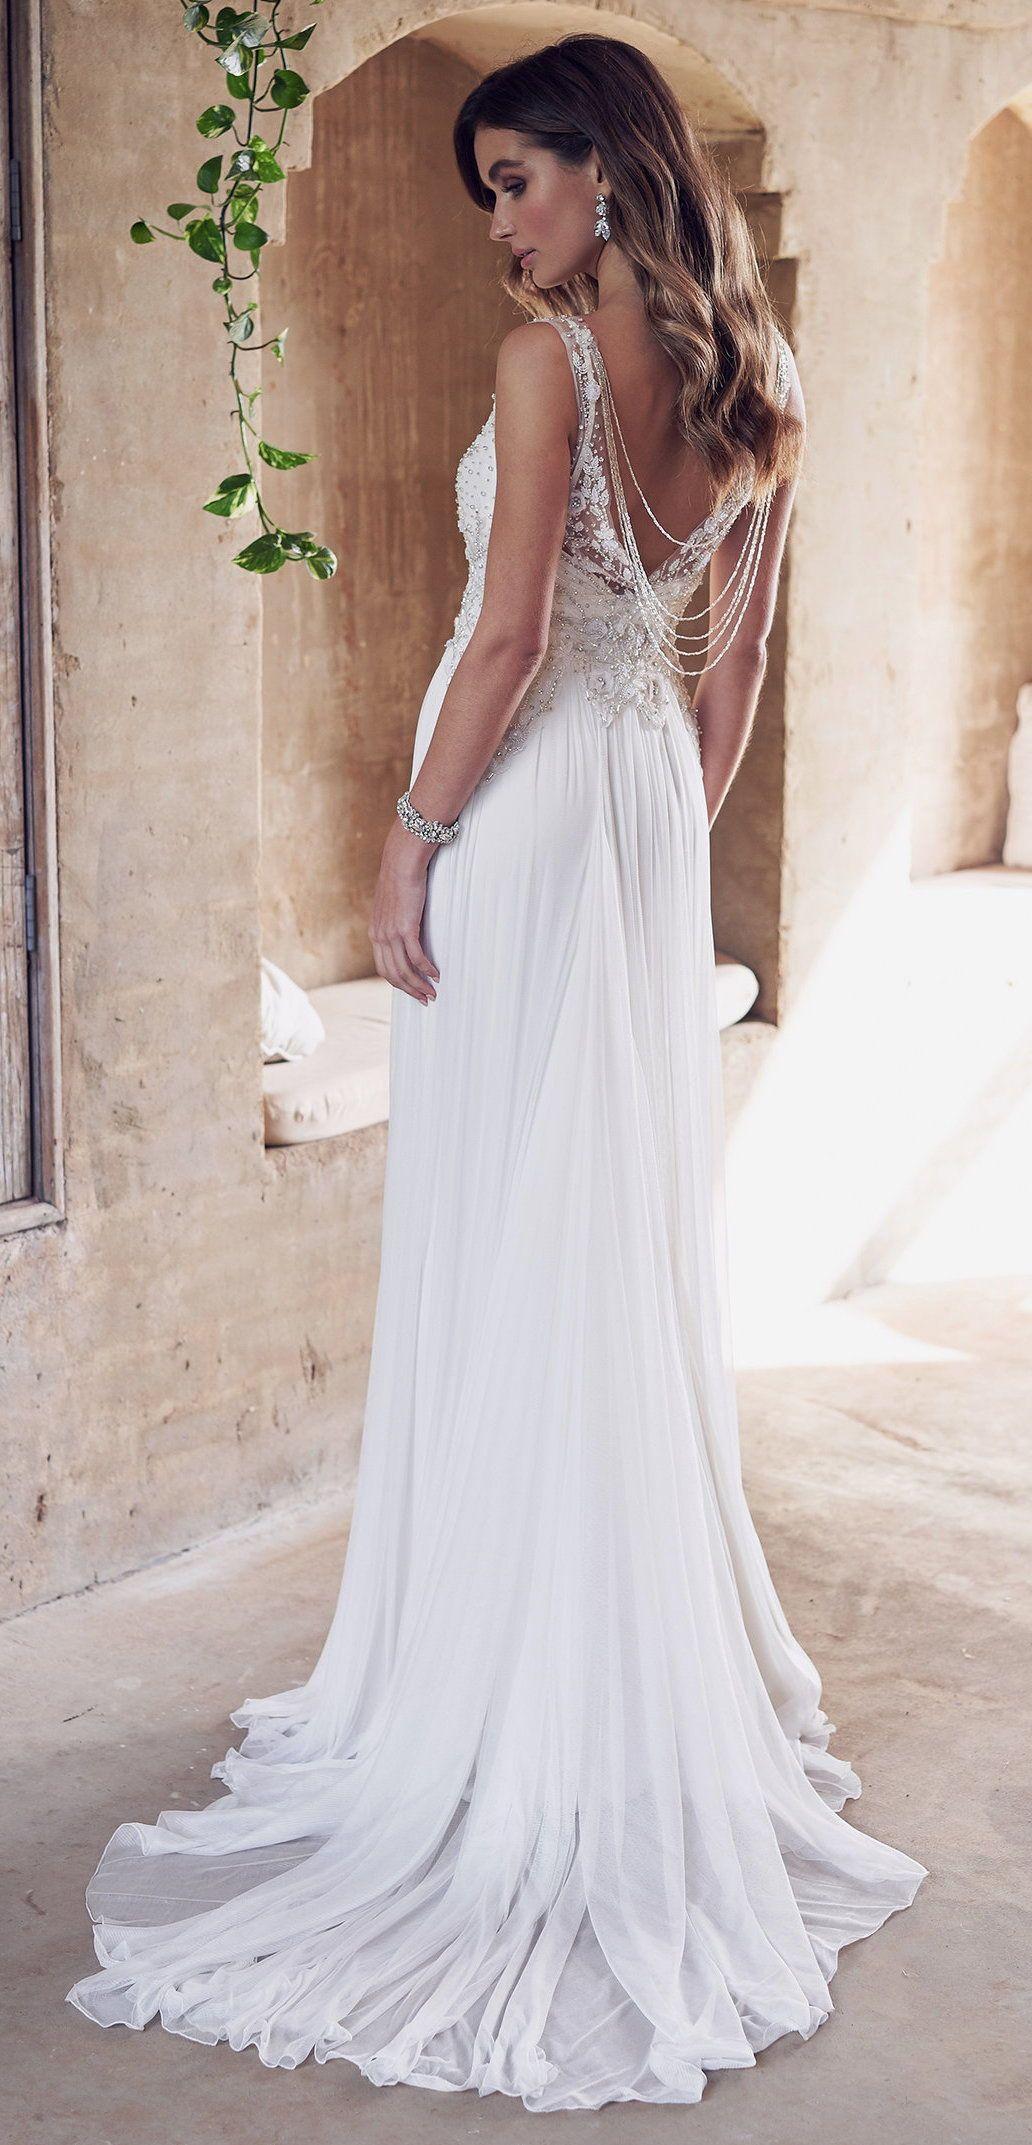 Romantic And Sparkling All Things Vintage Inspire Bridal Gown Stunning Custom Designed Cream Greek Wedding Dresses Wedding Dress Inspiration Wedding Dresses